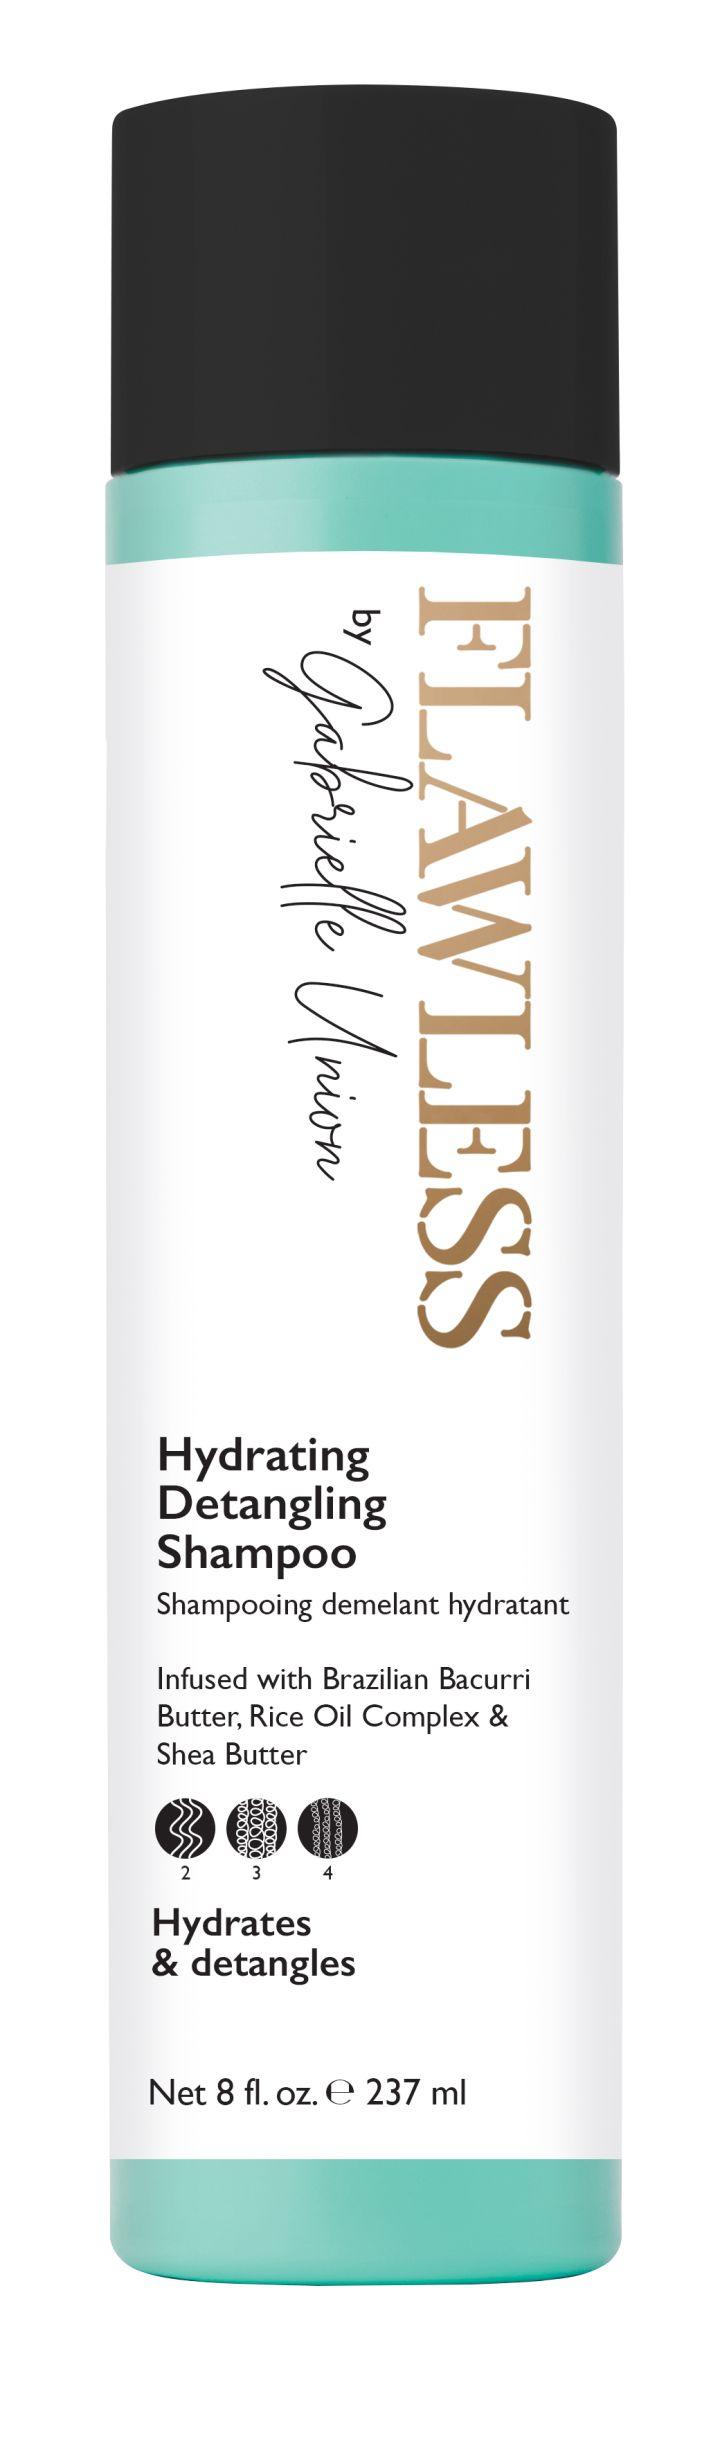 Flawless by Gabrielle Union Hydrating Detangling Shampoo